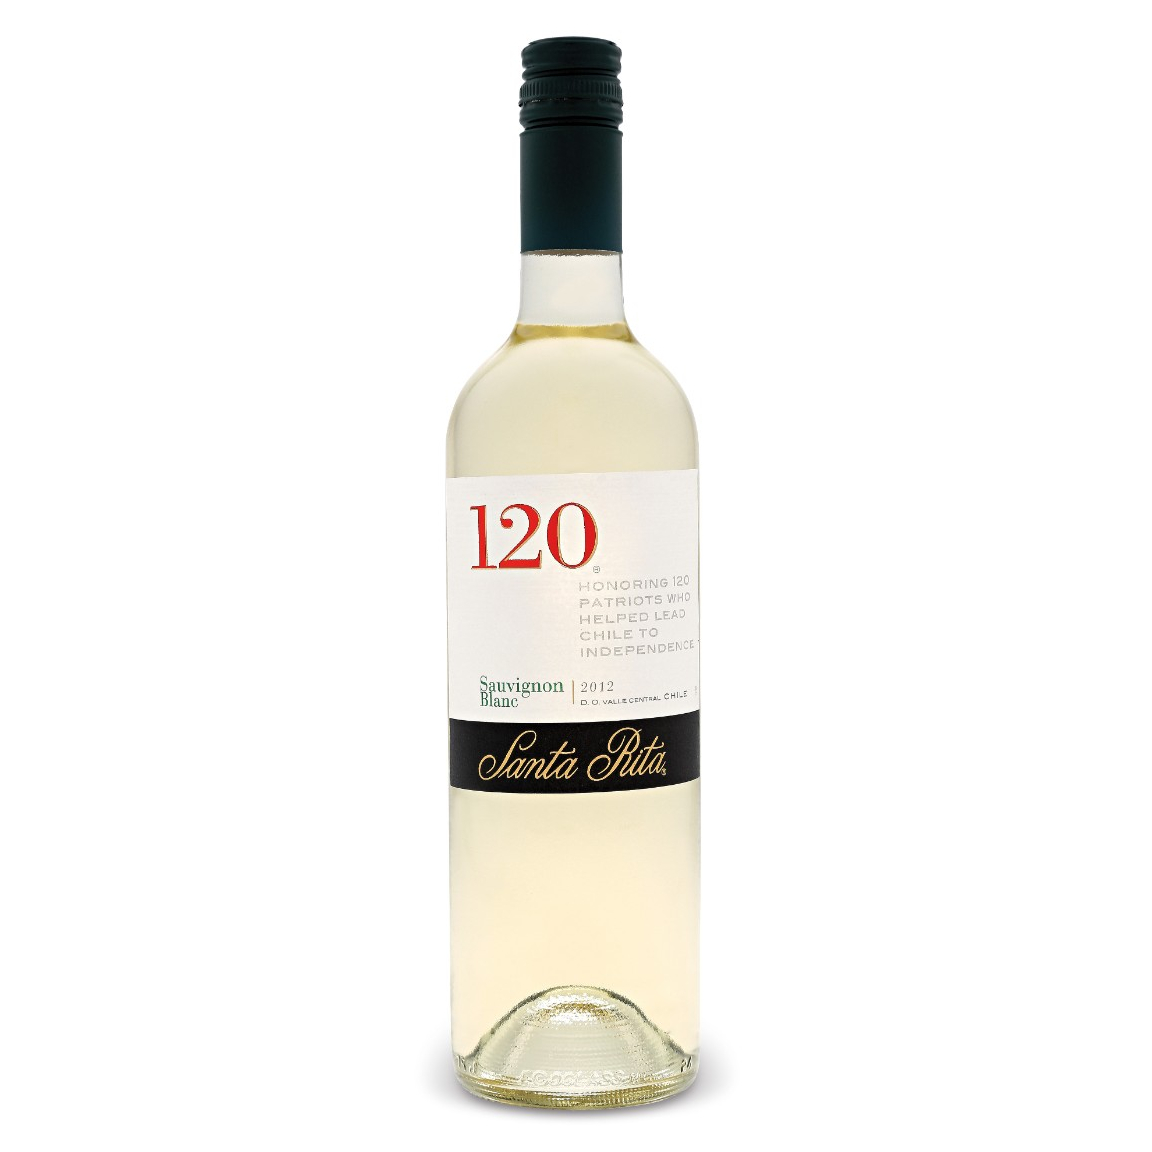 Santa Rita 120 Sauvignon Blanc - Bottle.jpeg